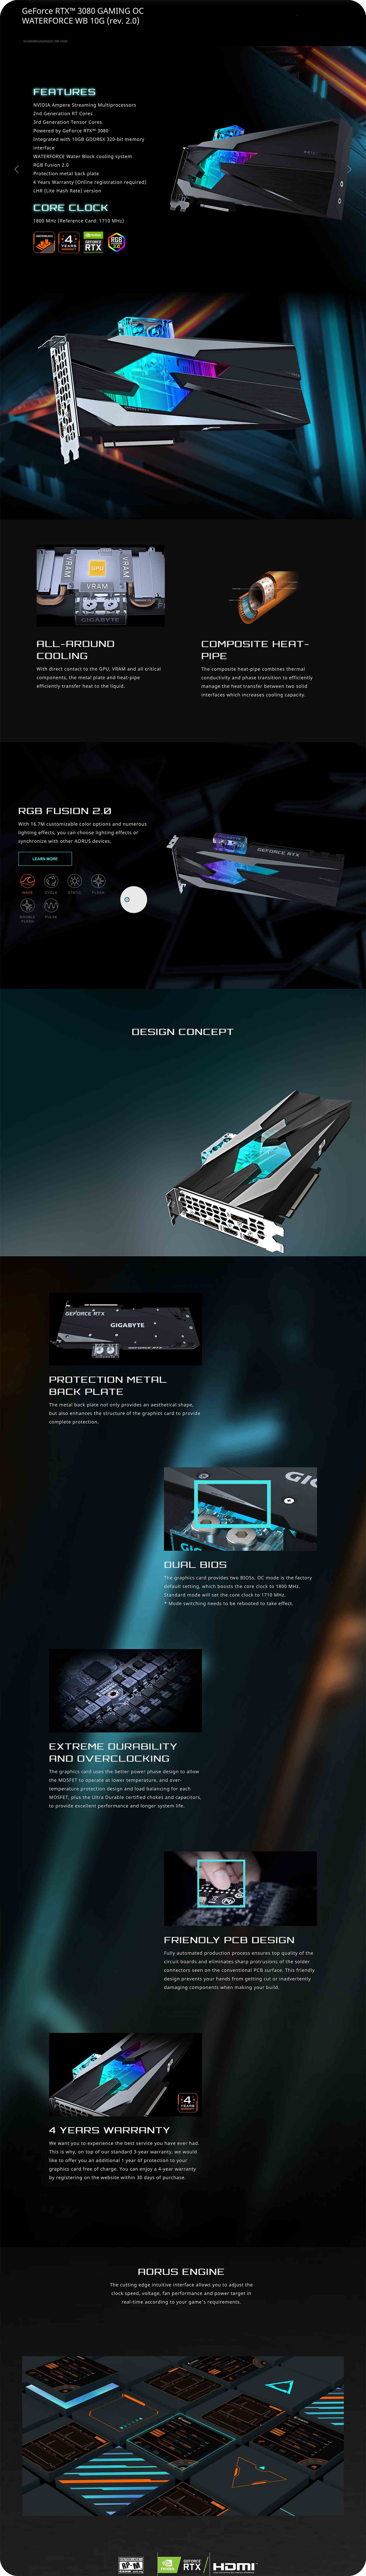 Gigabyte Nvidia GeForce RTX 3080 Gaming OC WB Rev2.0 10GB LHR Graphics Card